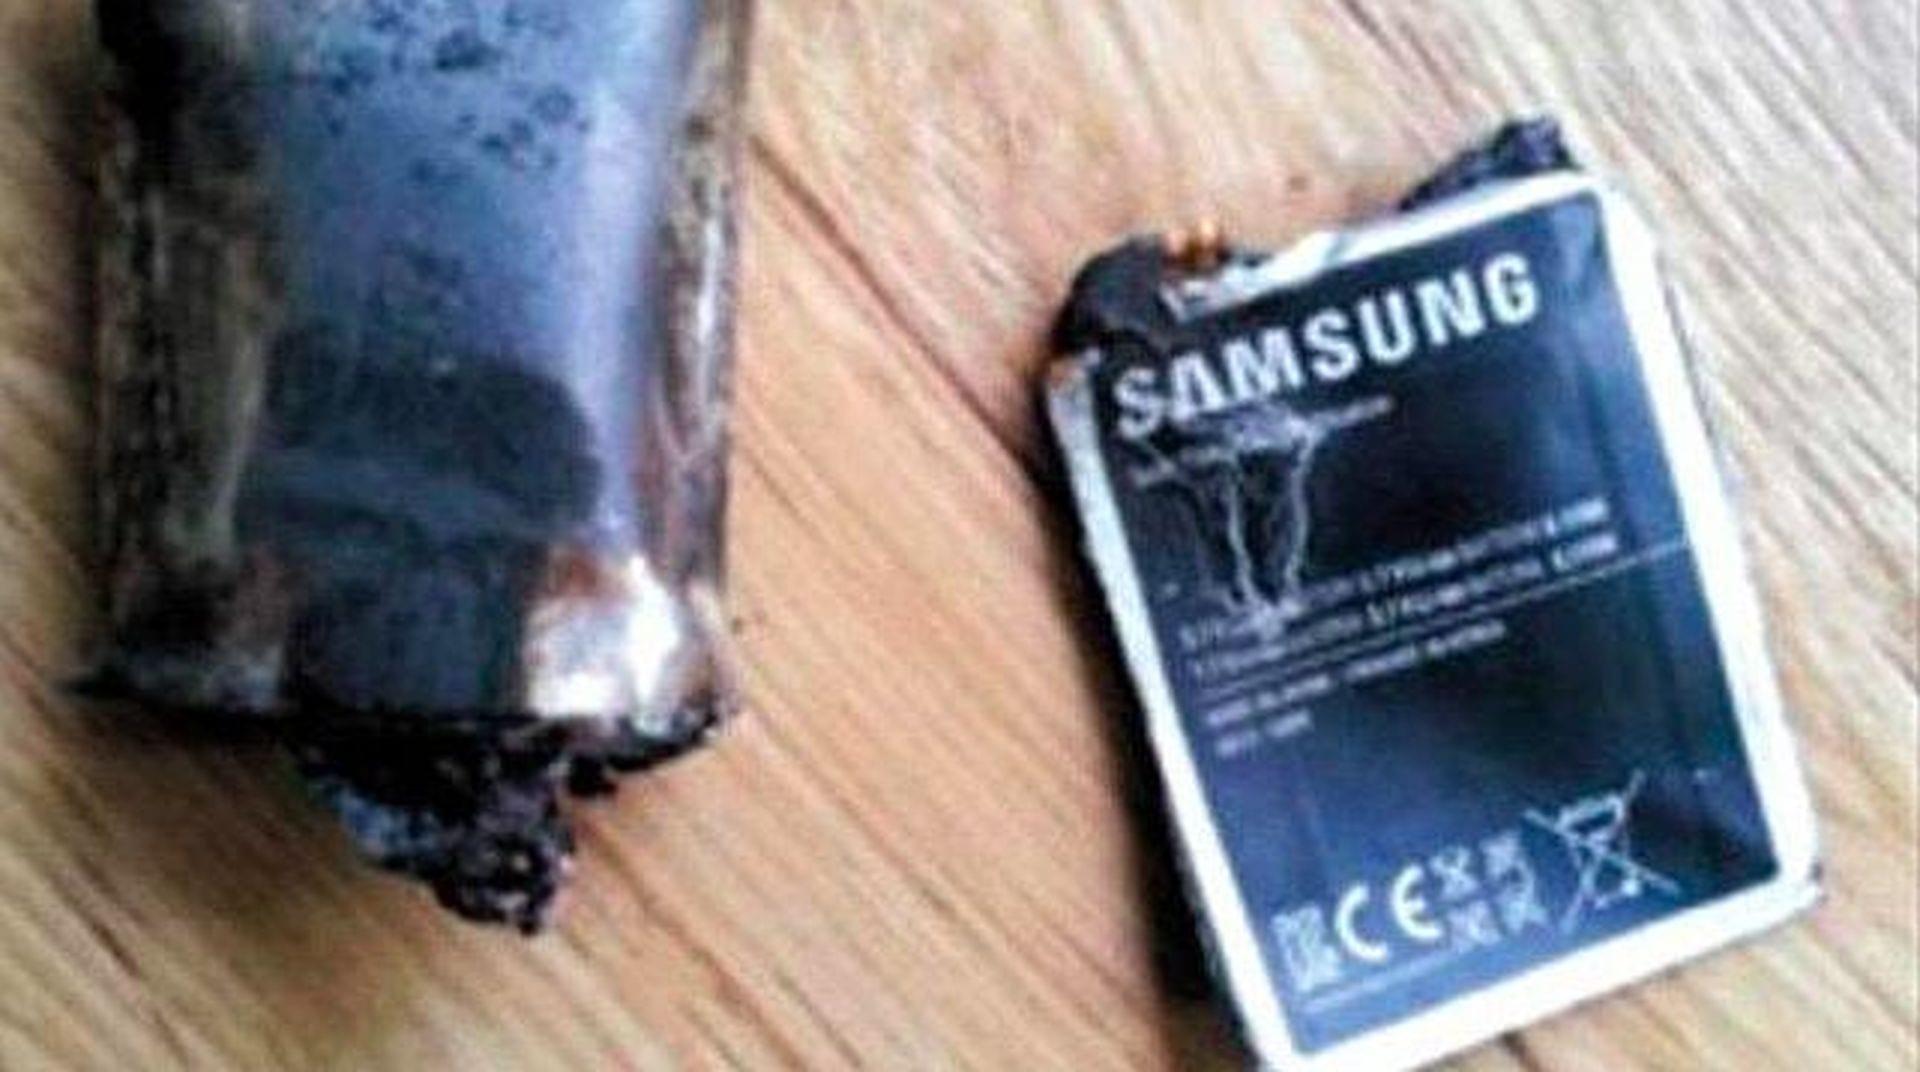 Samsung Explota